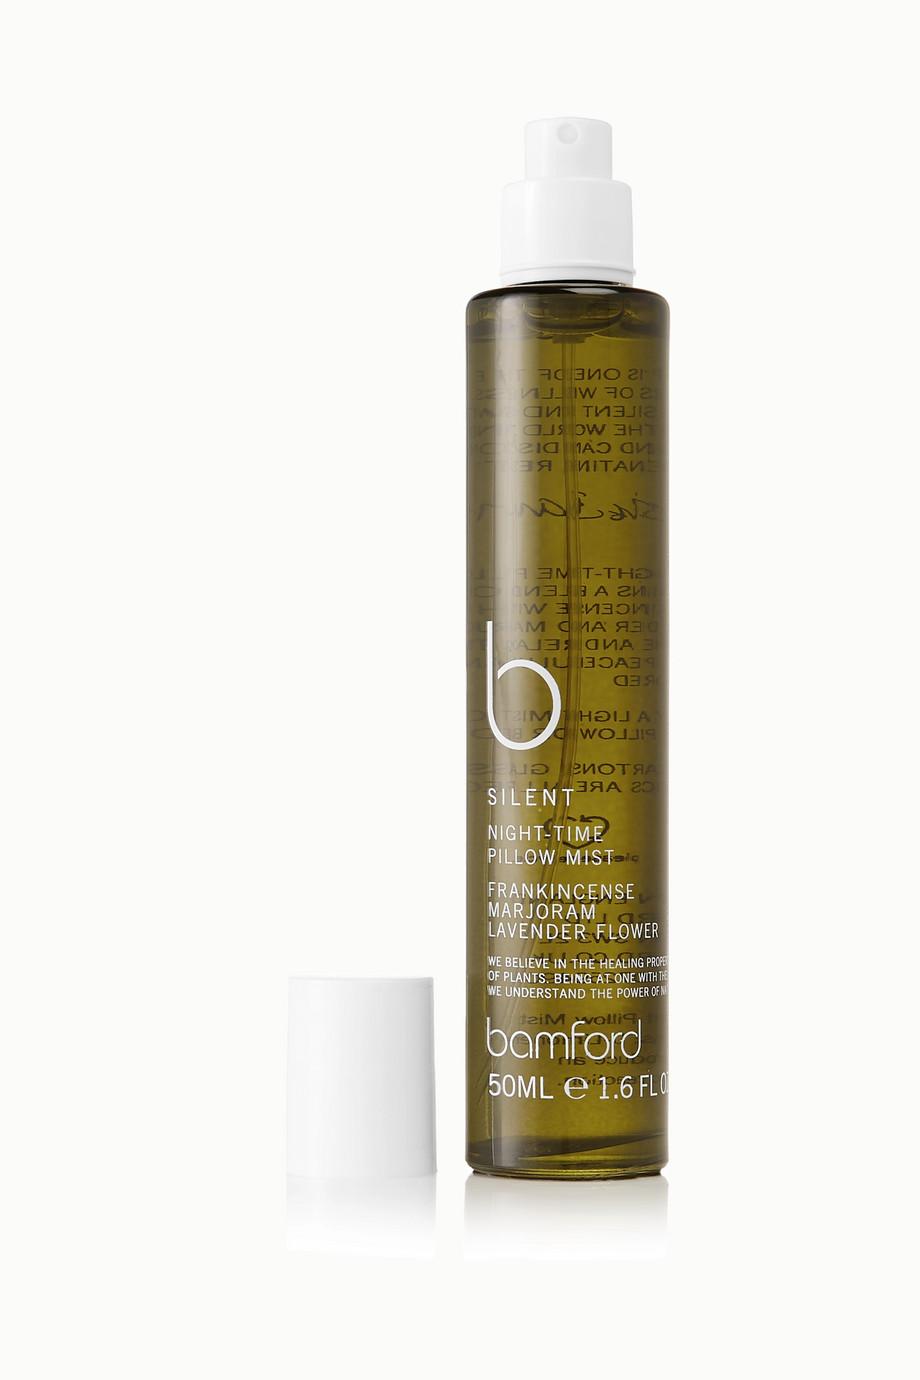 Bamford B Silent Night-Time Pillow Mist, 50 ml – Kissenspray